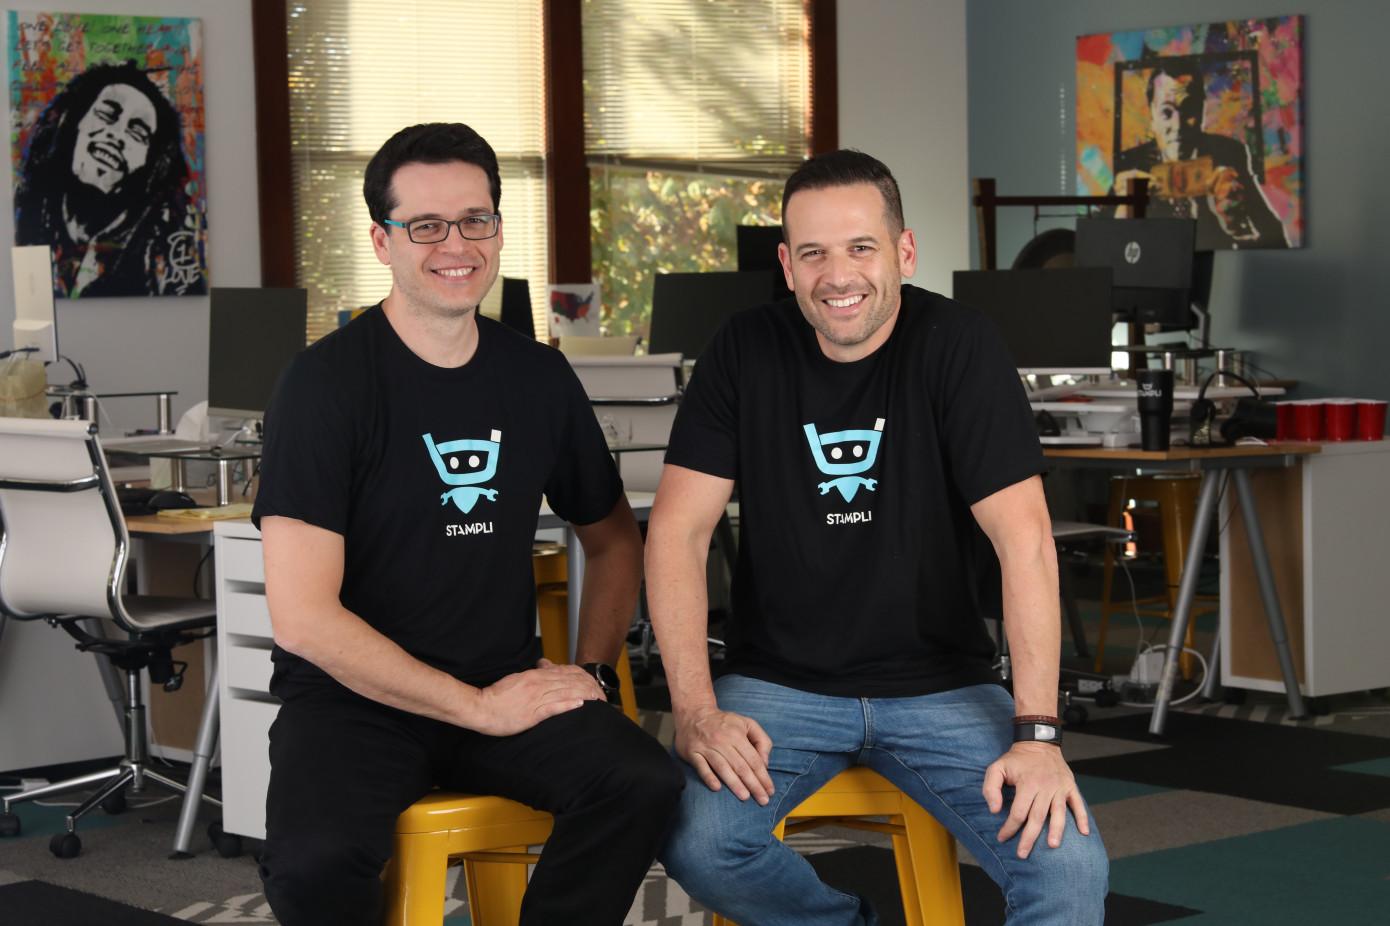 Stampli在B轮融资中筹集了2500万美元将人工智能带入发票管理